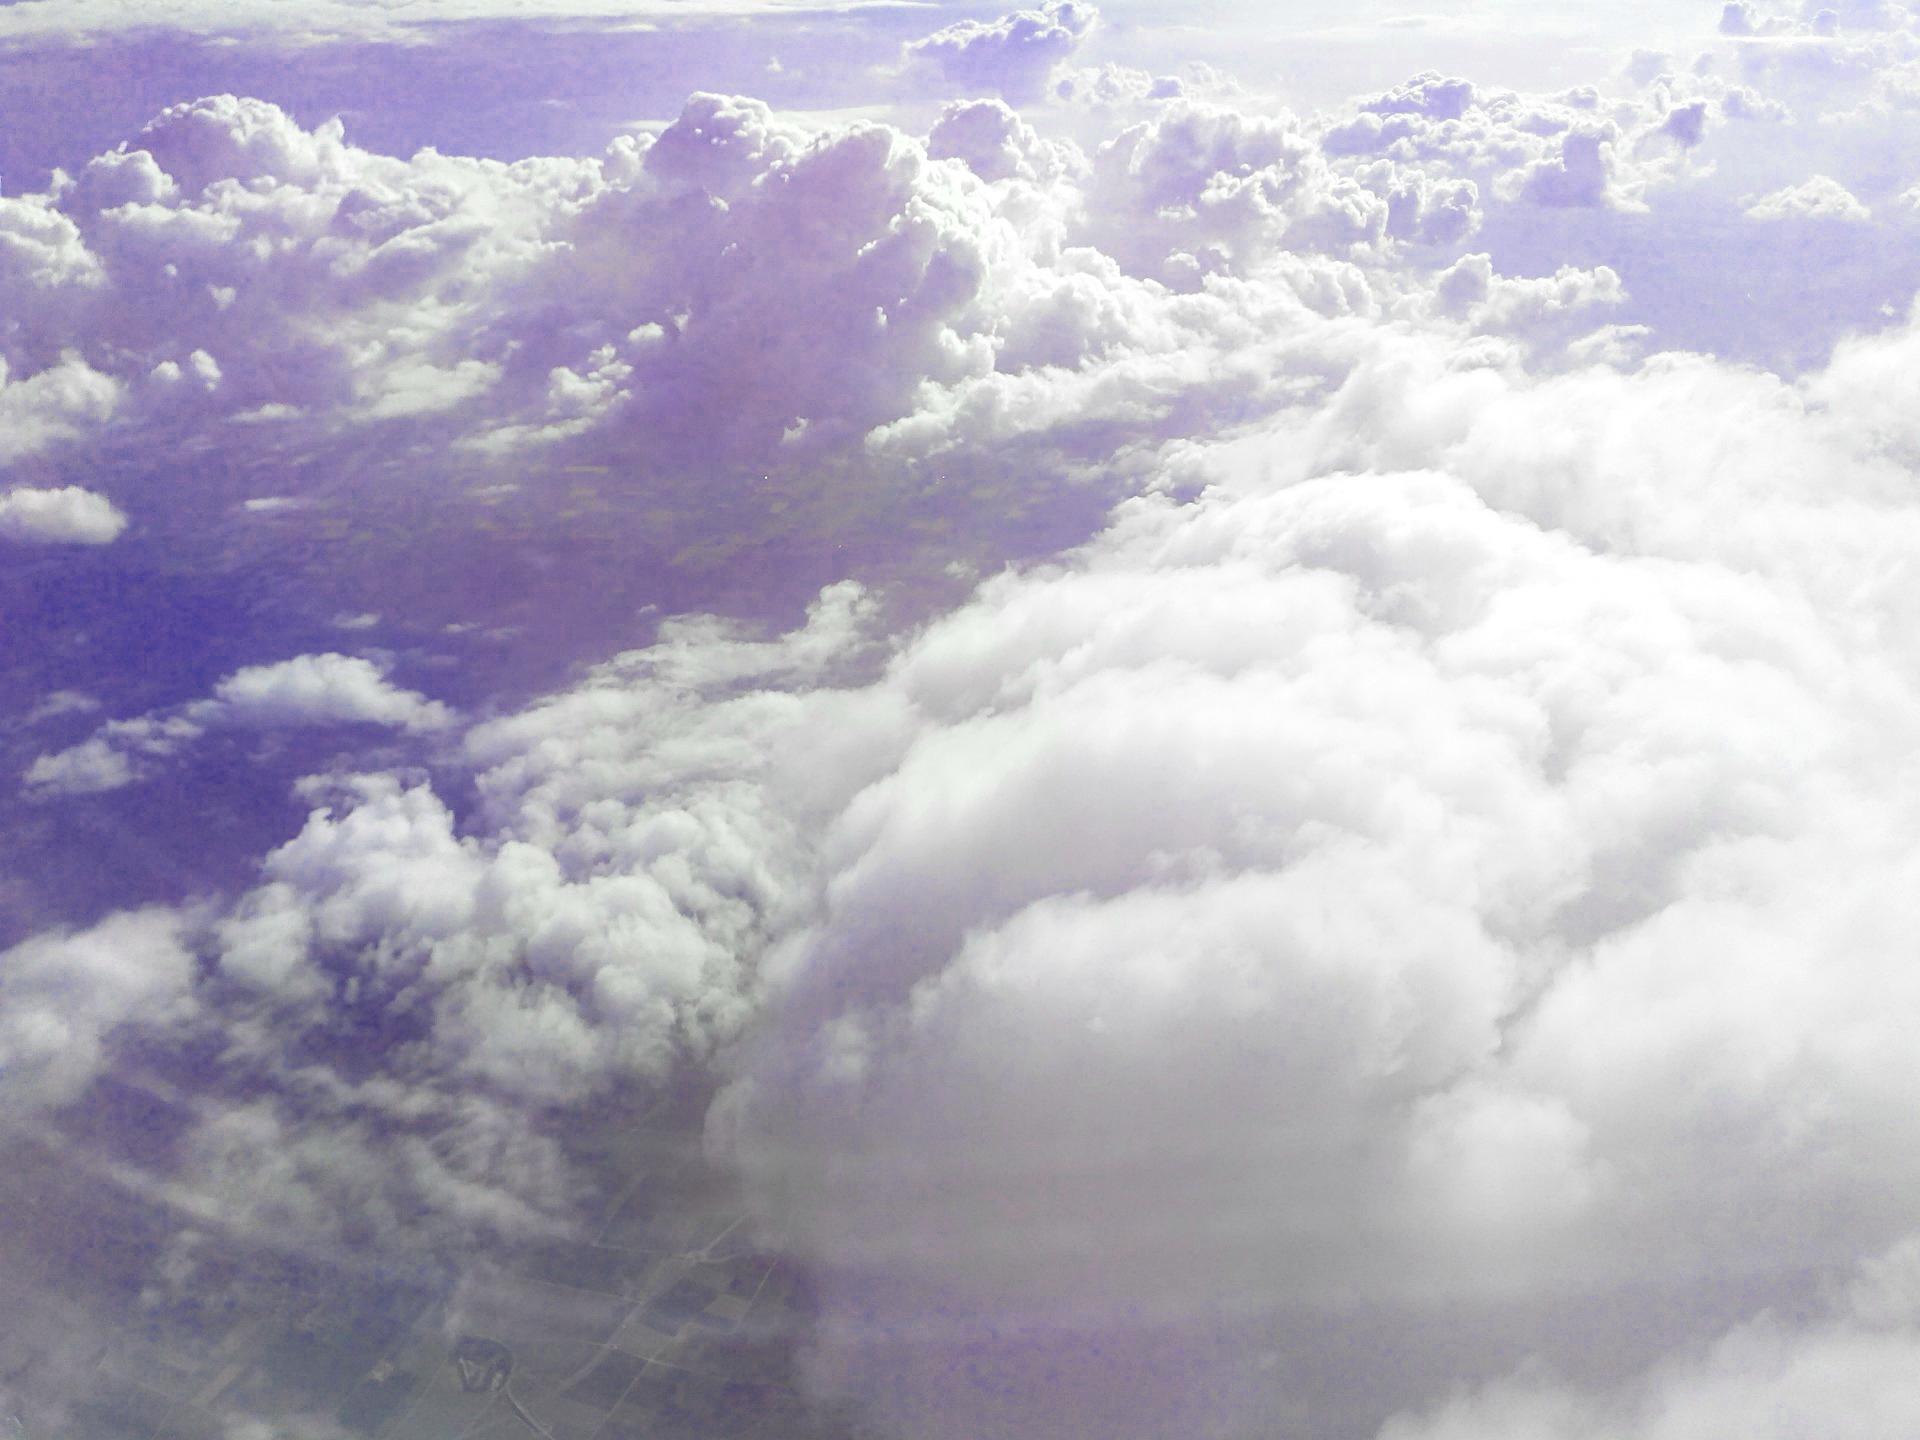 clouds-310112_1920.jpg